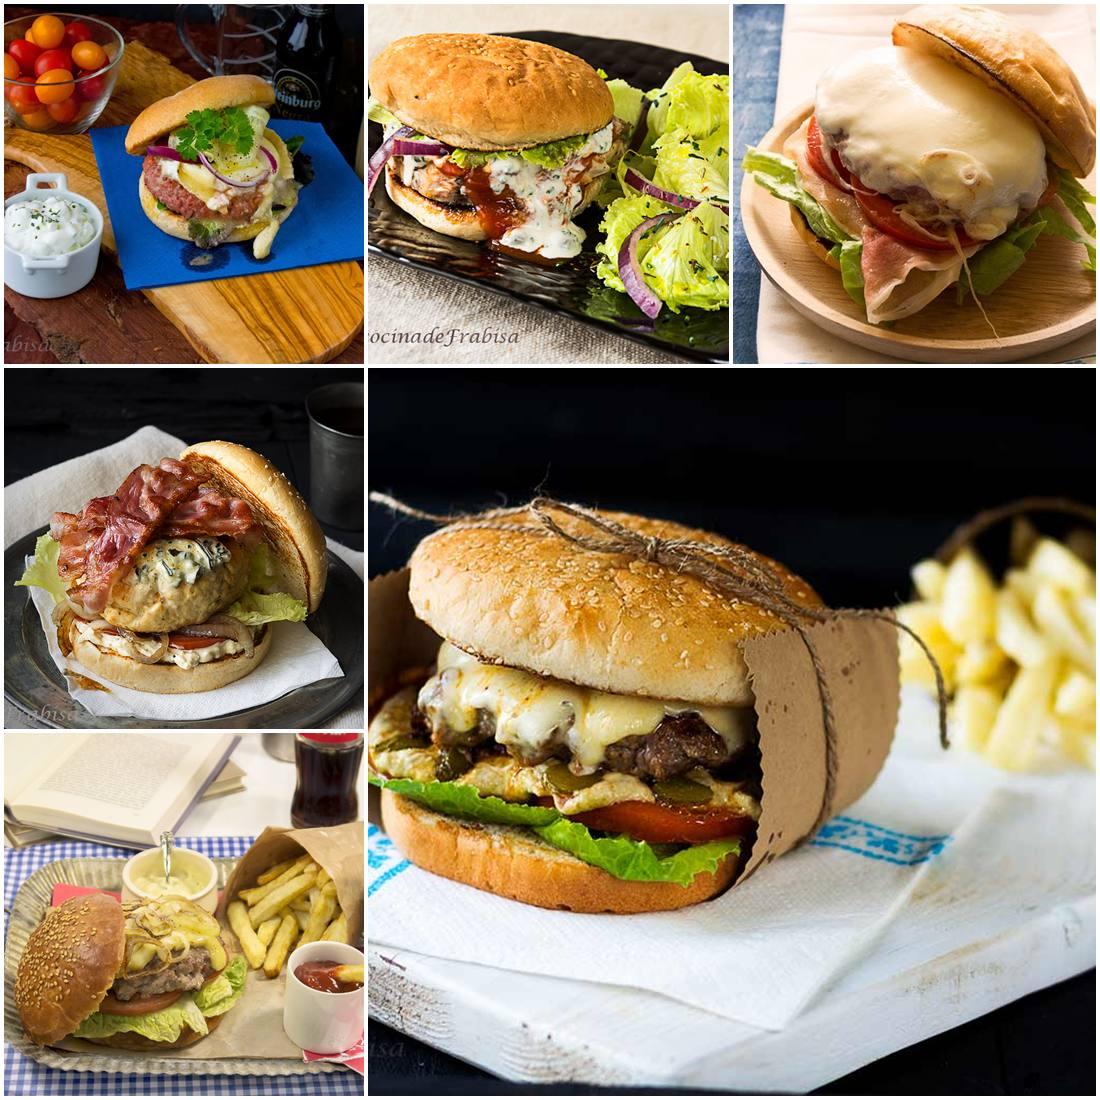 hamburguesas, burguer, trucos, consejos